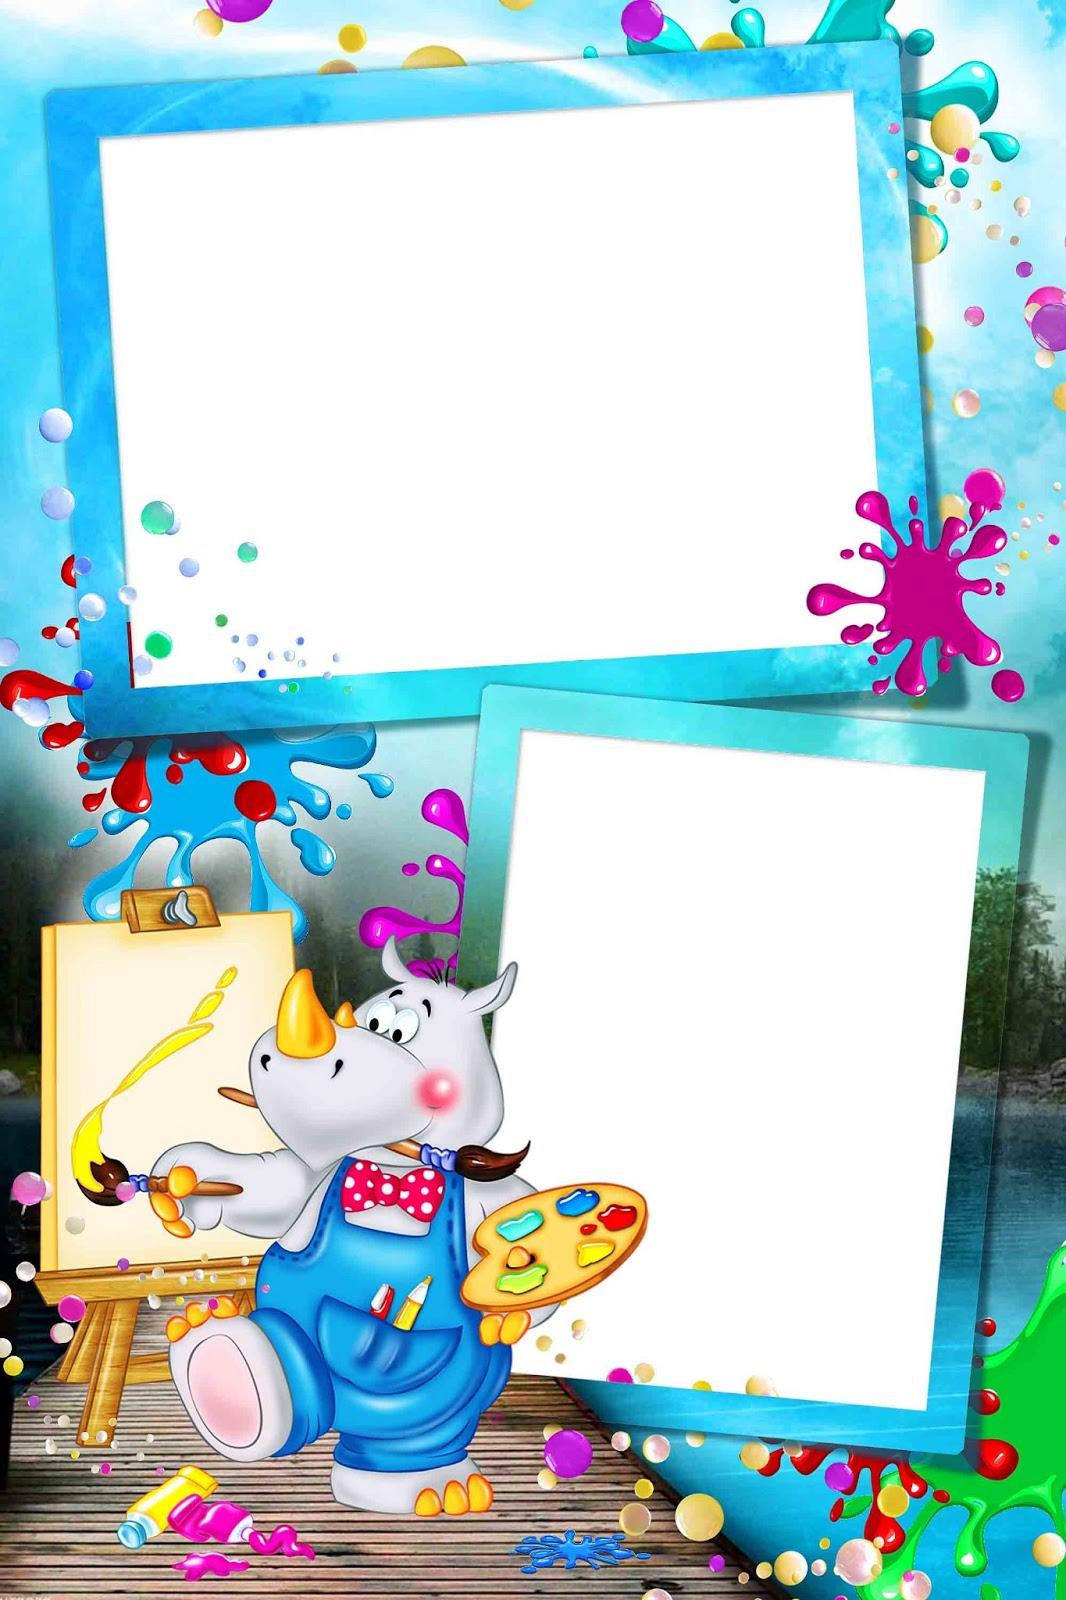 png frame for kids | net frame